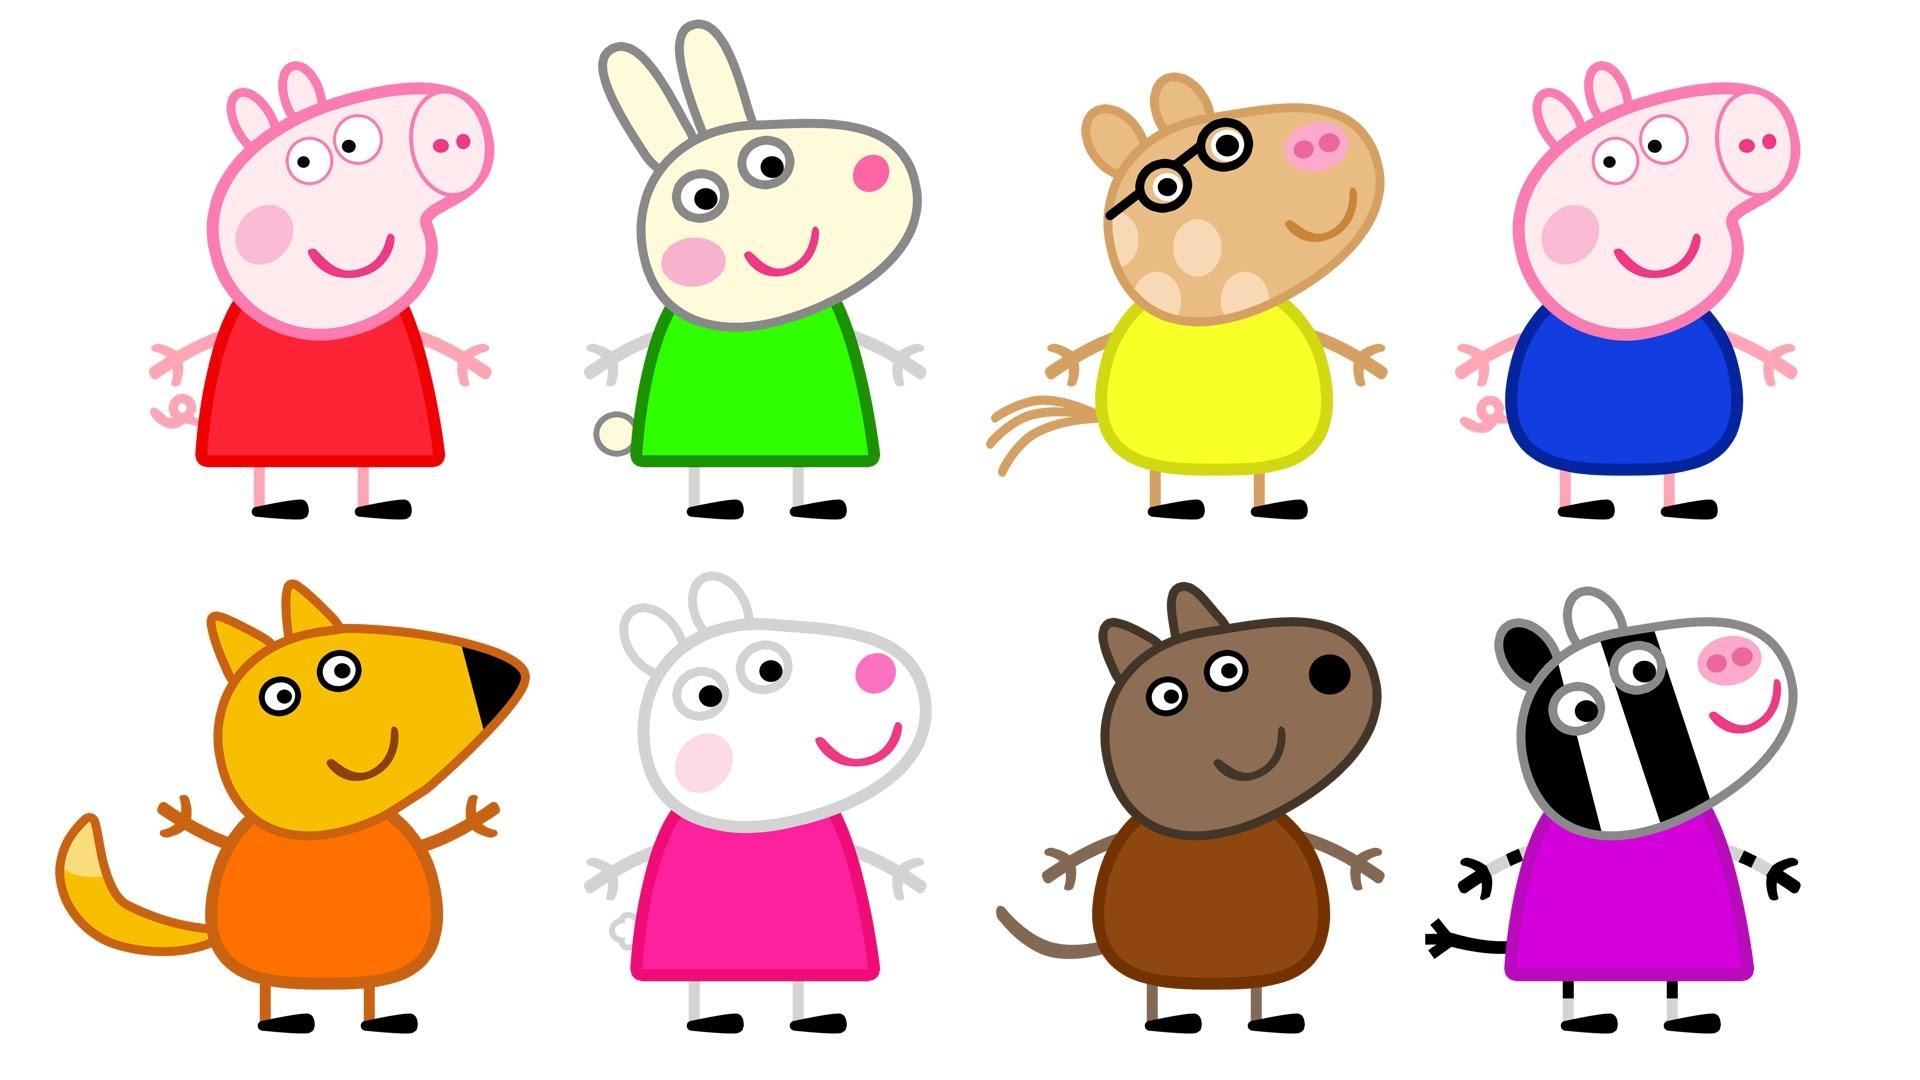 Peppa Pig Clipart | Free Download Best Peppa Pig Clipart On - Peppa Pig Character Free Printable Images